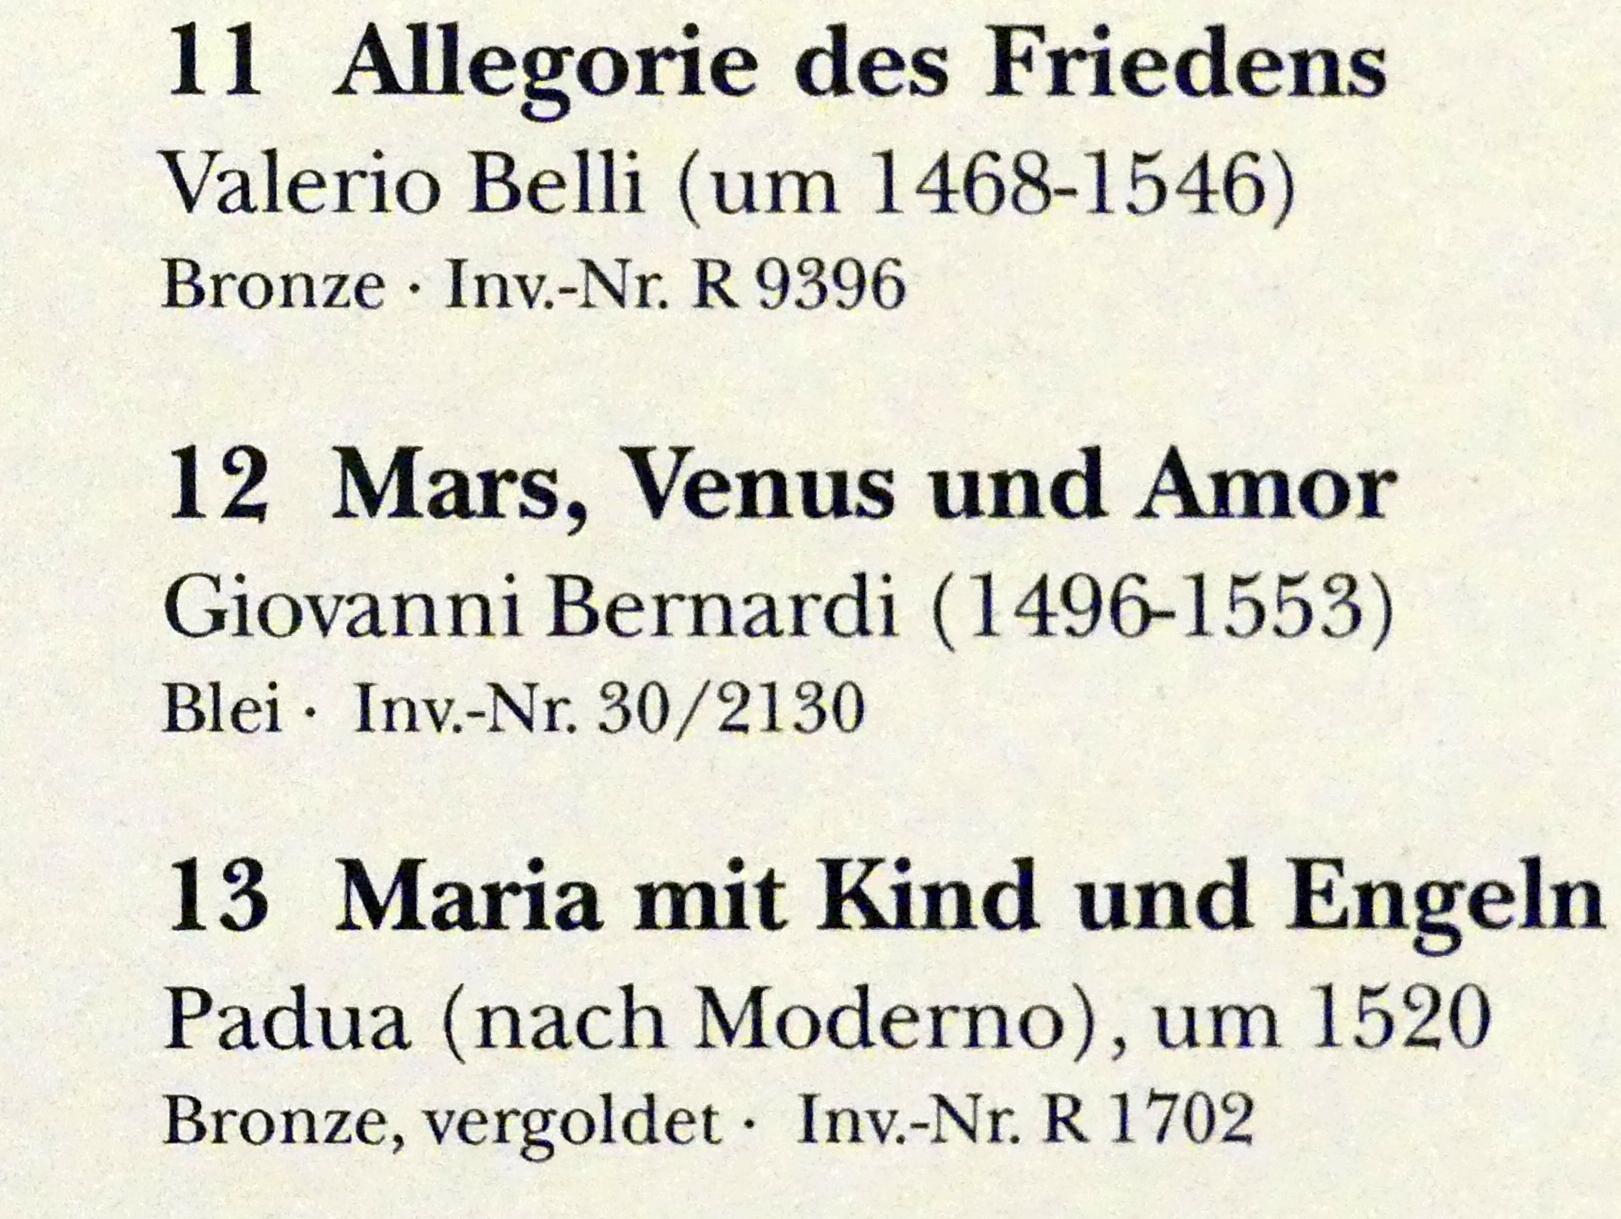 Giovanni Bernardi: Mars, Venus und Amor, Undatiert, Bild 2/2